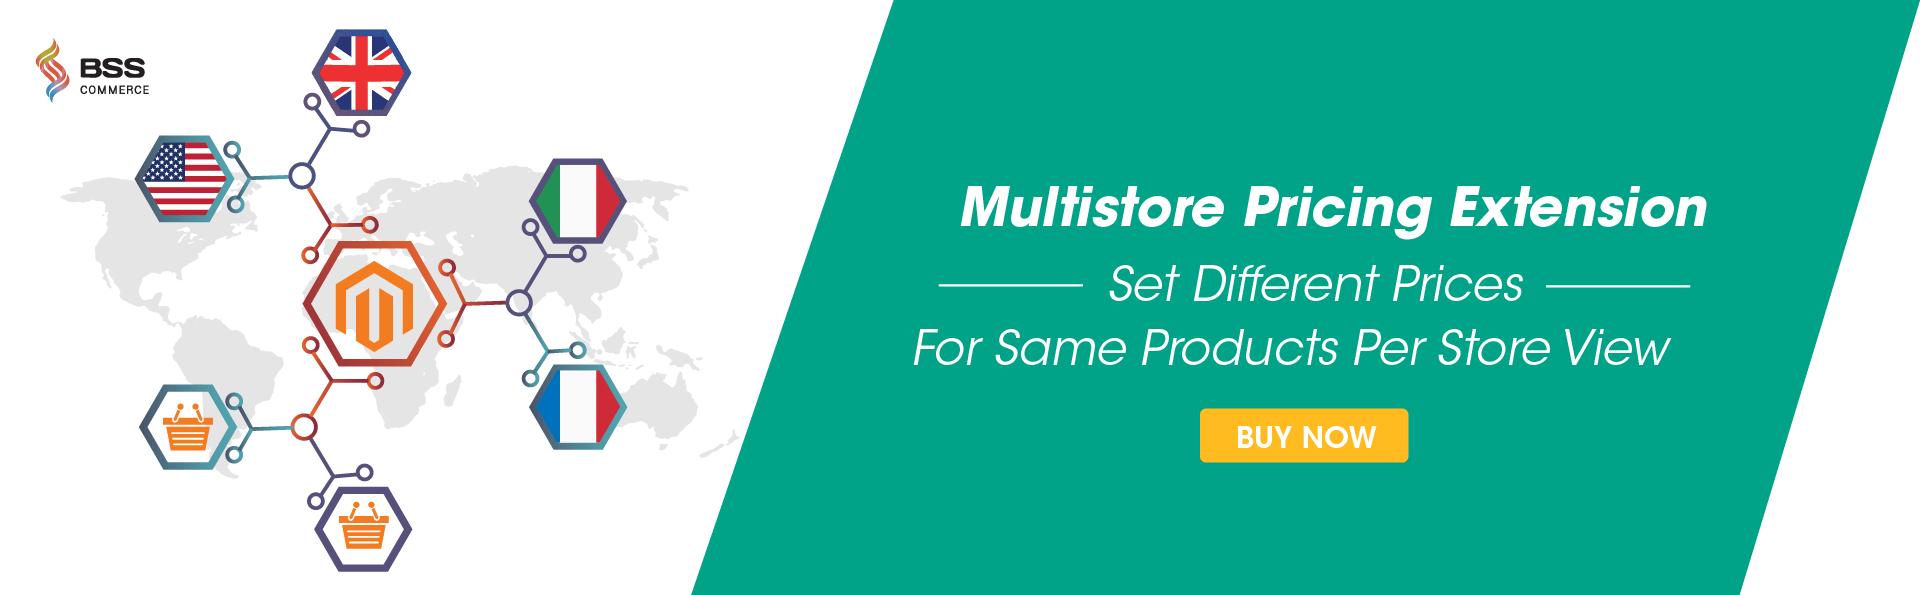 Multistore Pricing